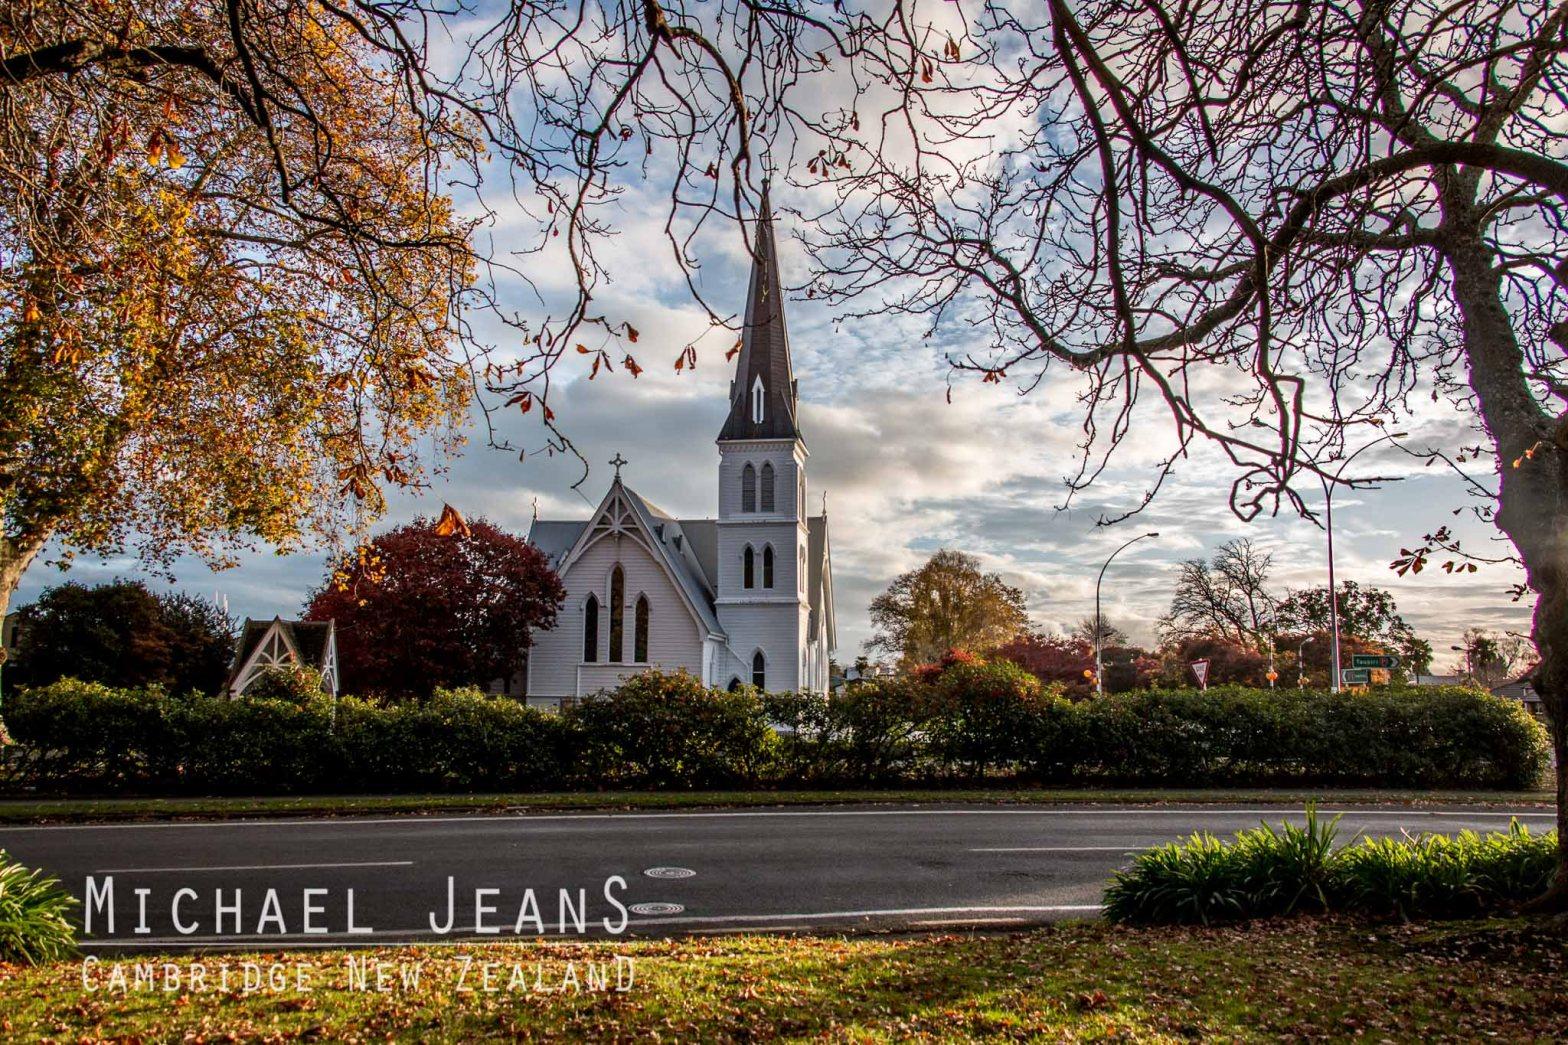 St Andrews Anglican Church Te Kō Utu Park Cambridge Domain New Zealand